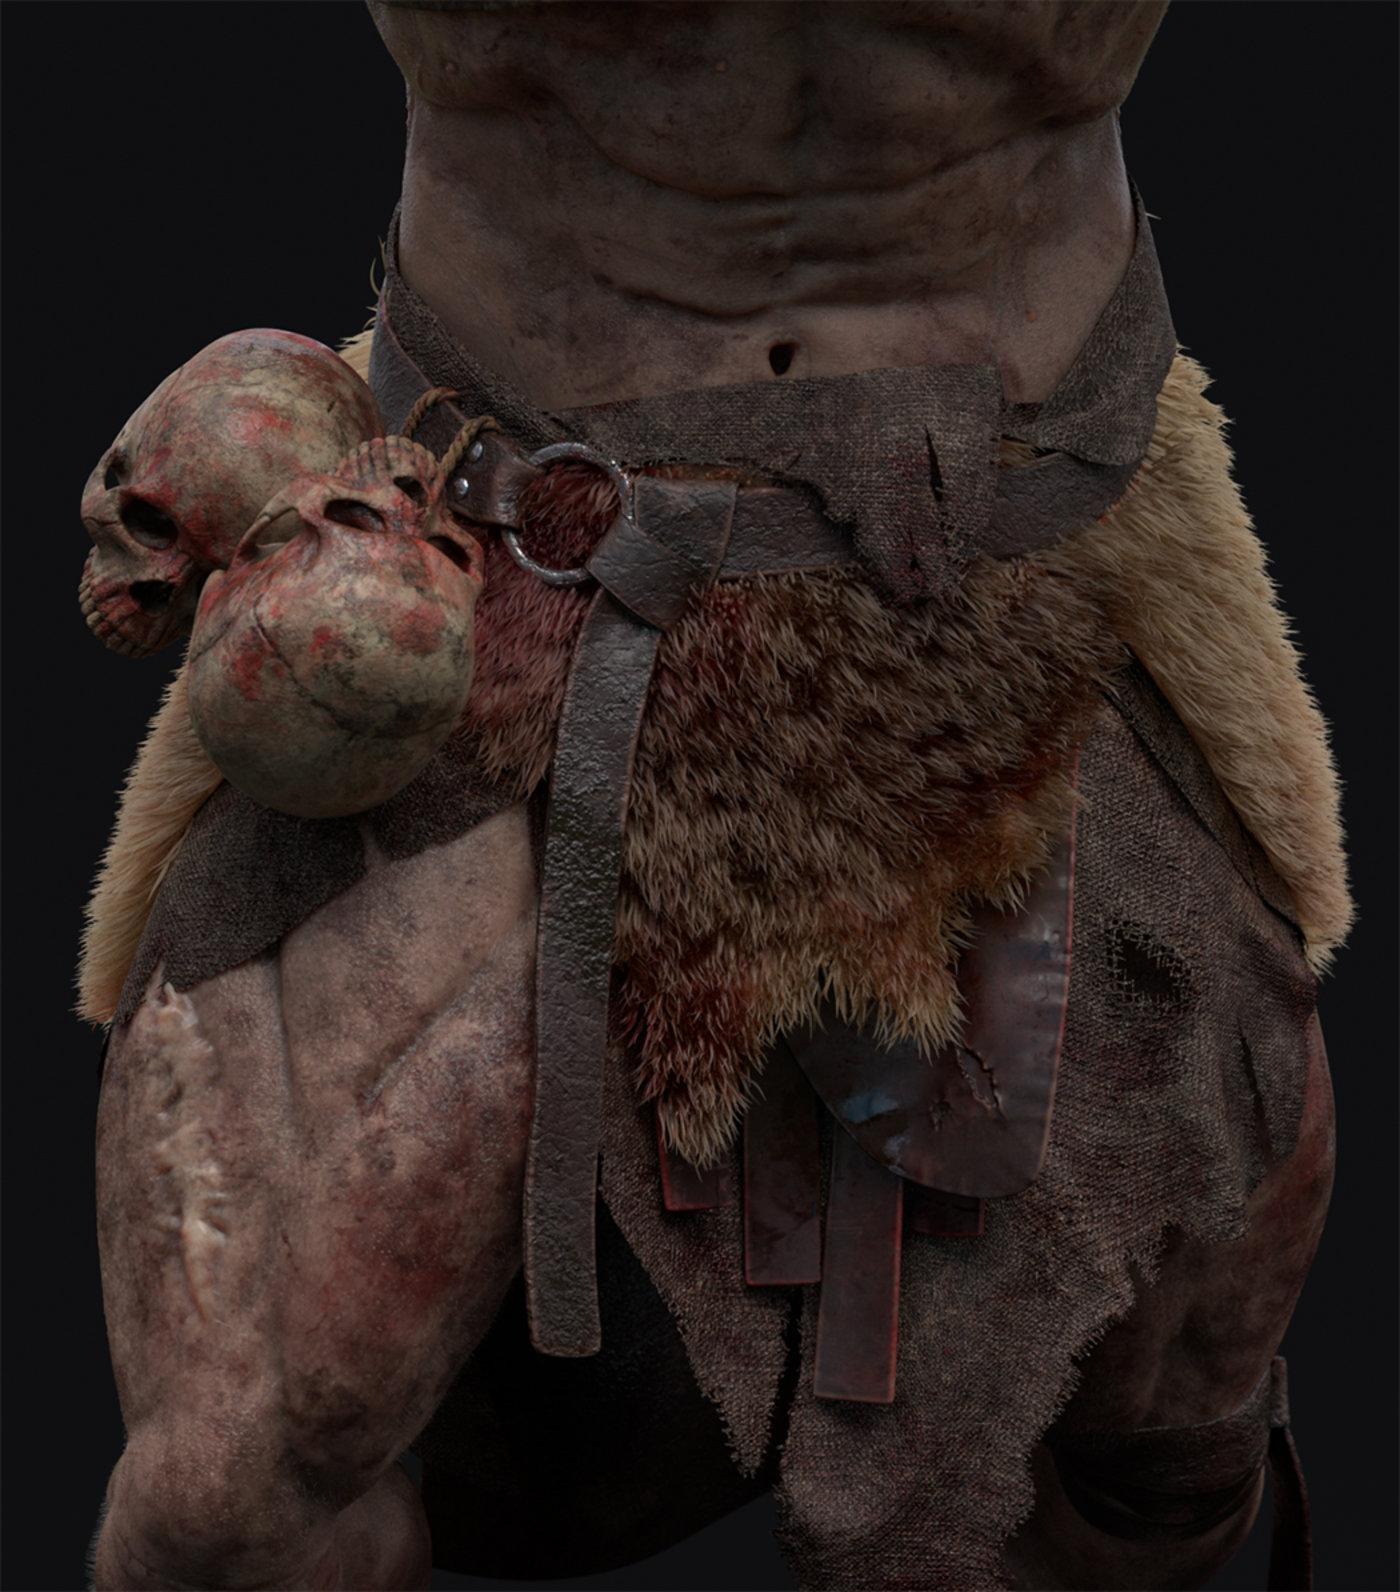 The Berberian Creature